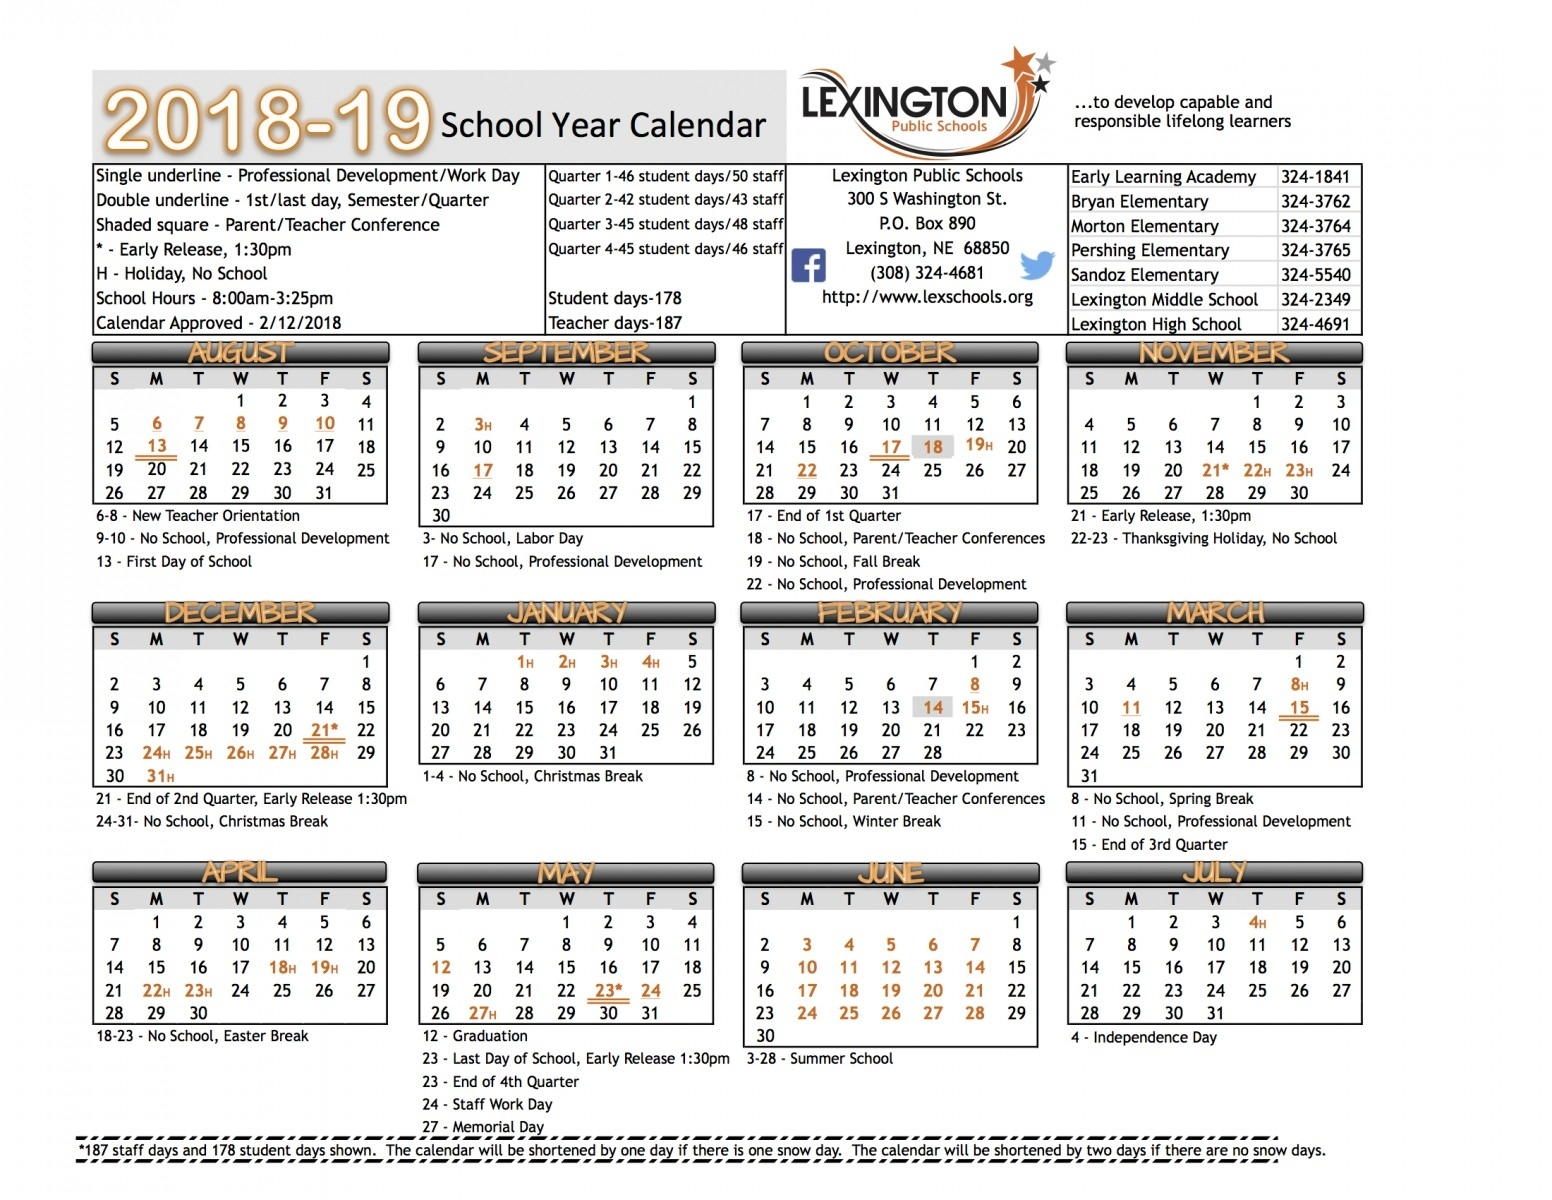 School Year Calendar - Lexington Public Schools Exceptional Lexington 1 School Calendar